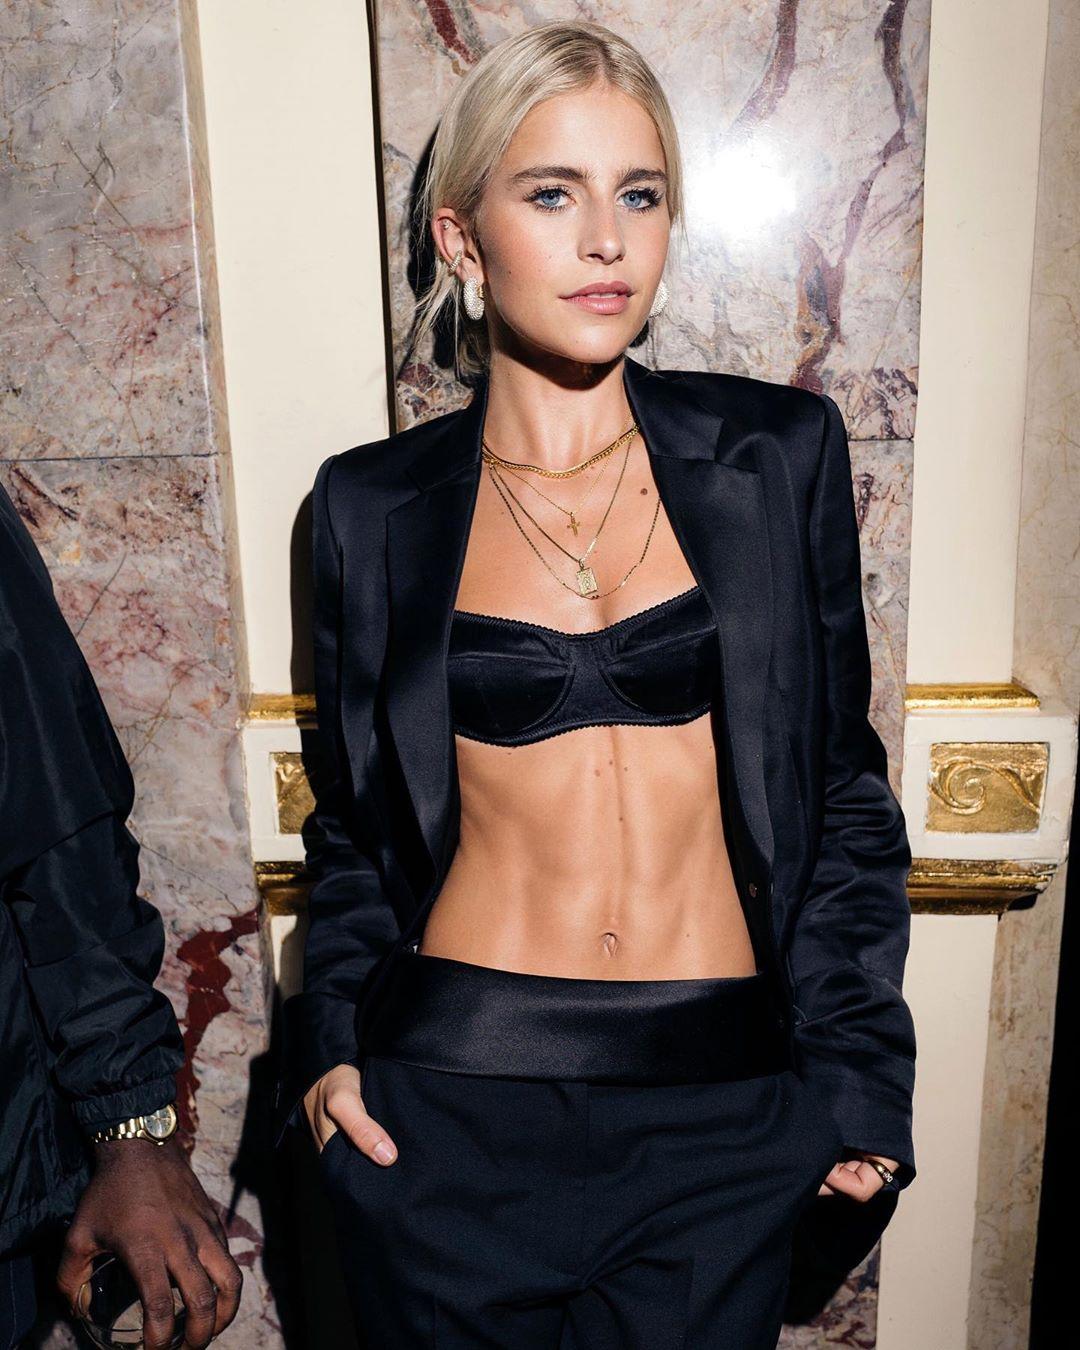 Bra Tops: Η τάση που έχει ξετρελάνει τις fashion lovers